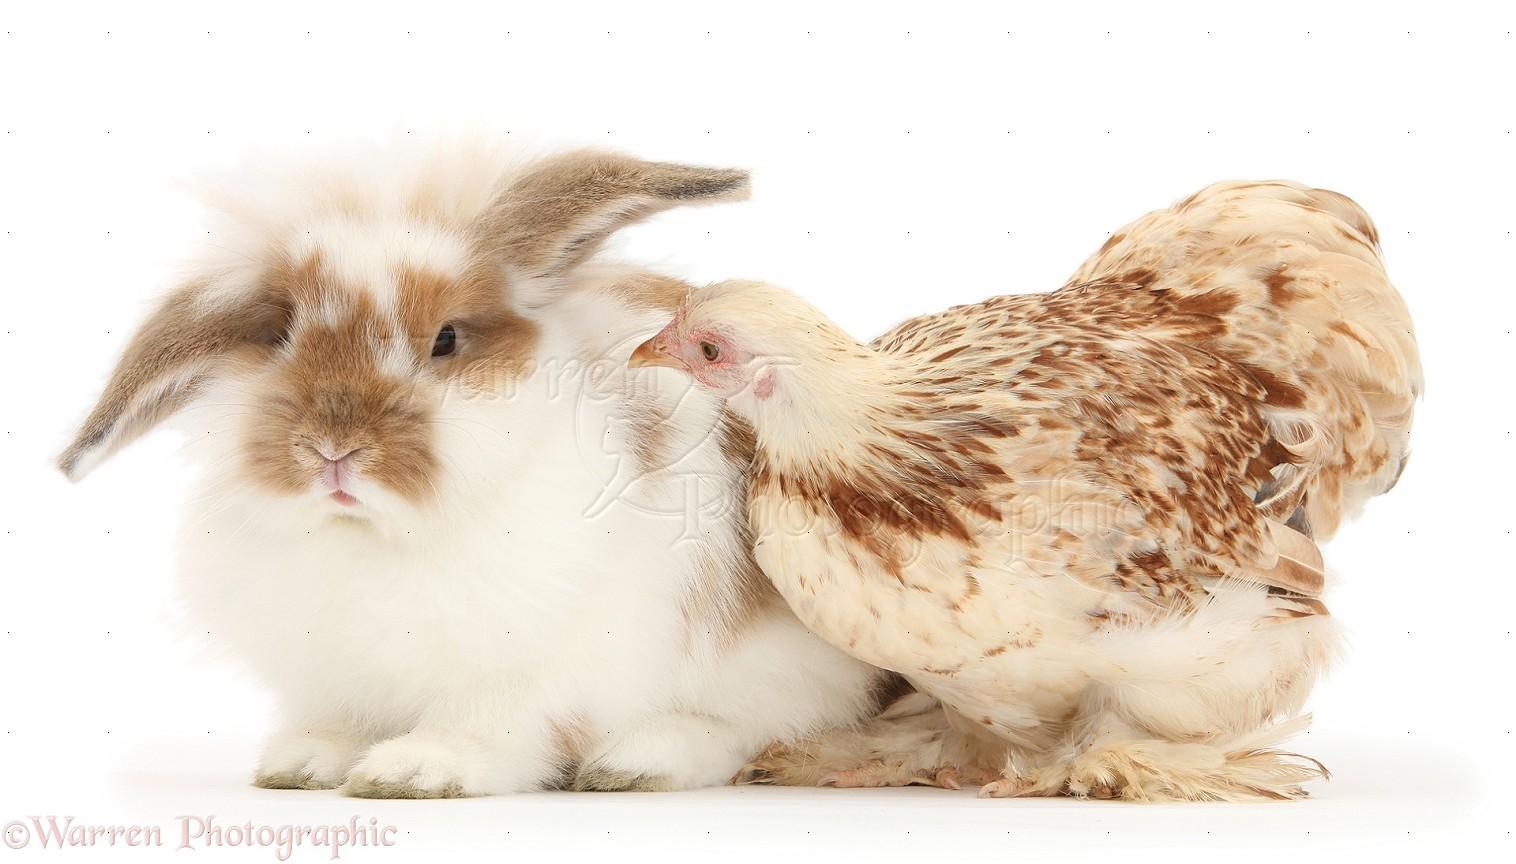 WP34057 Bantam chicken and rabbit.